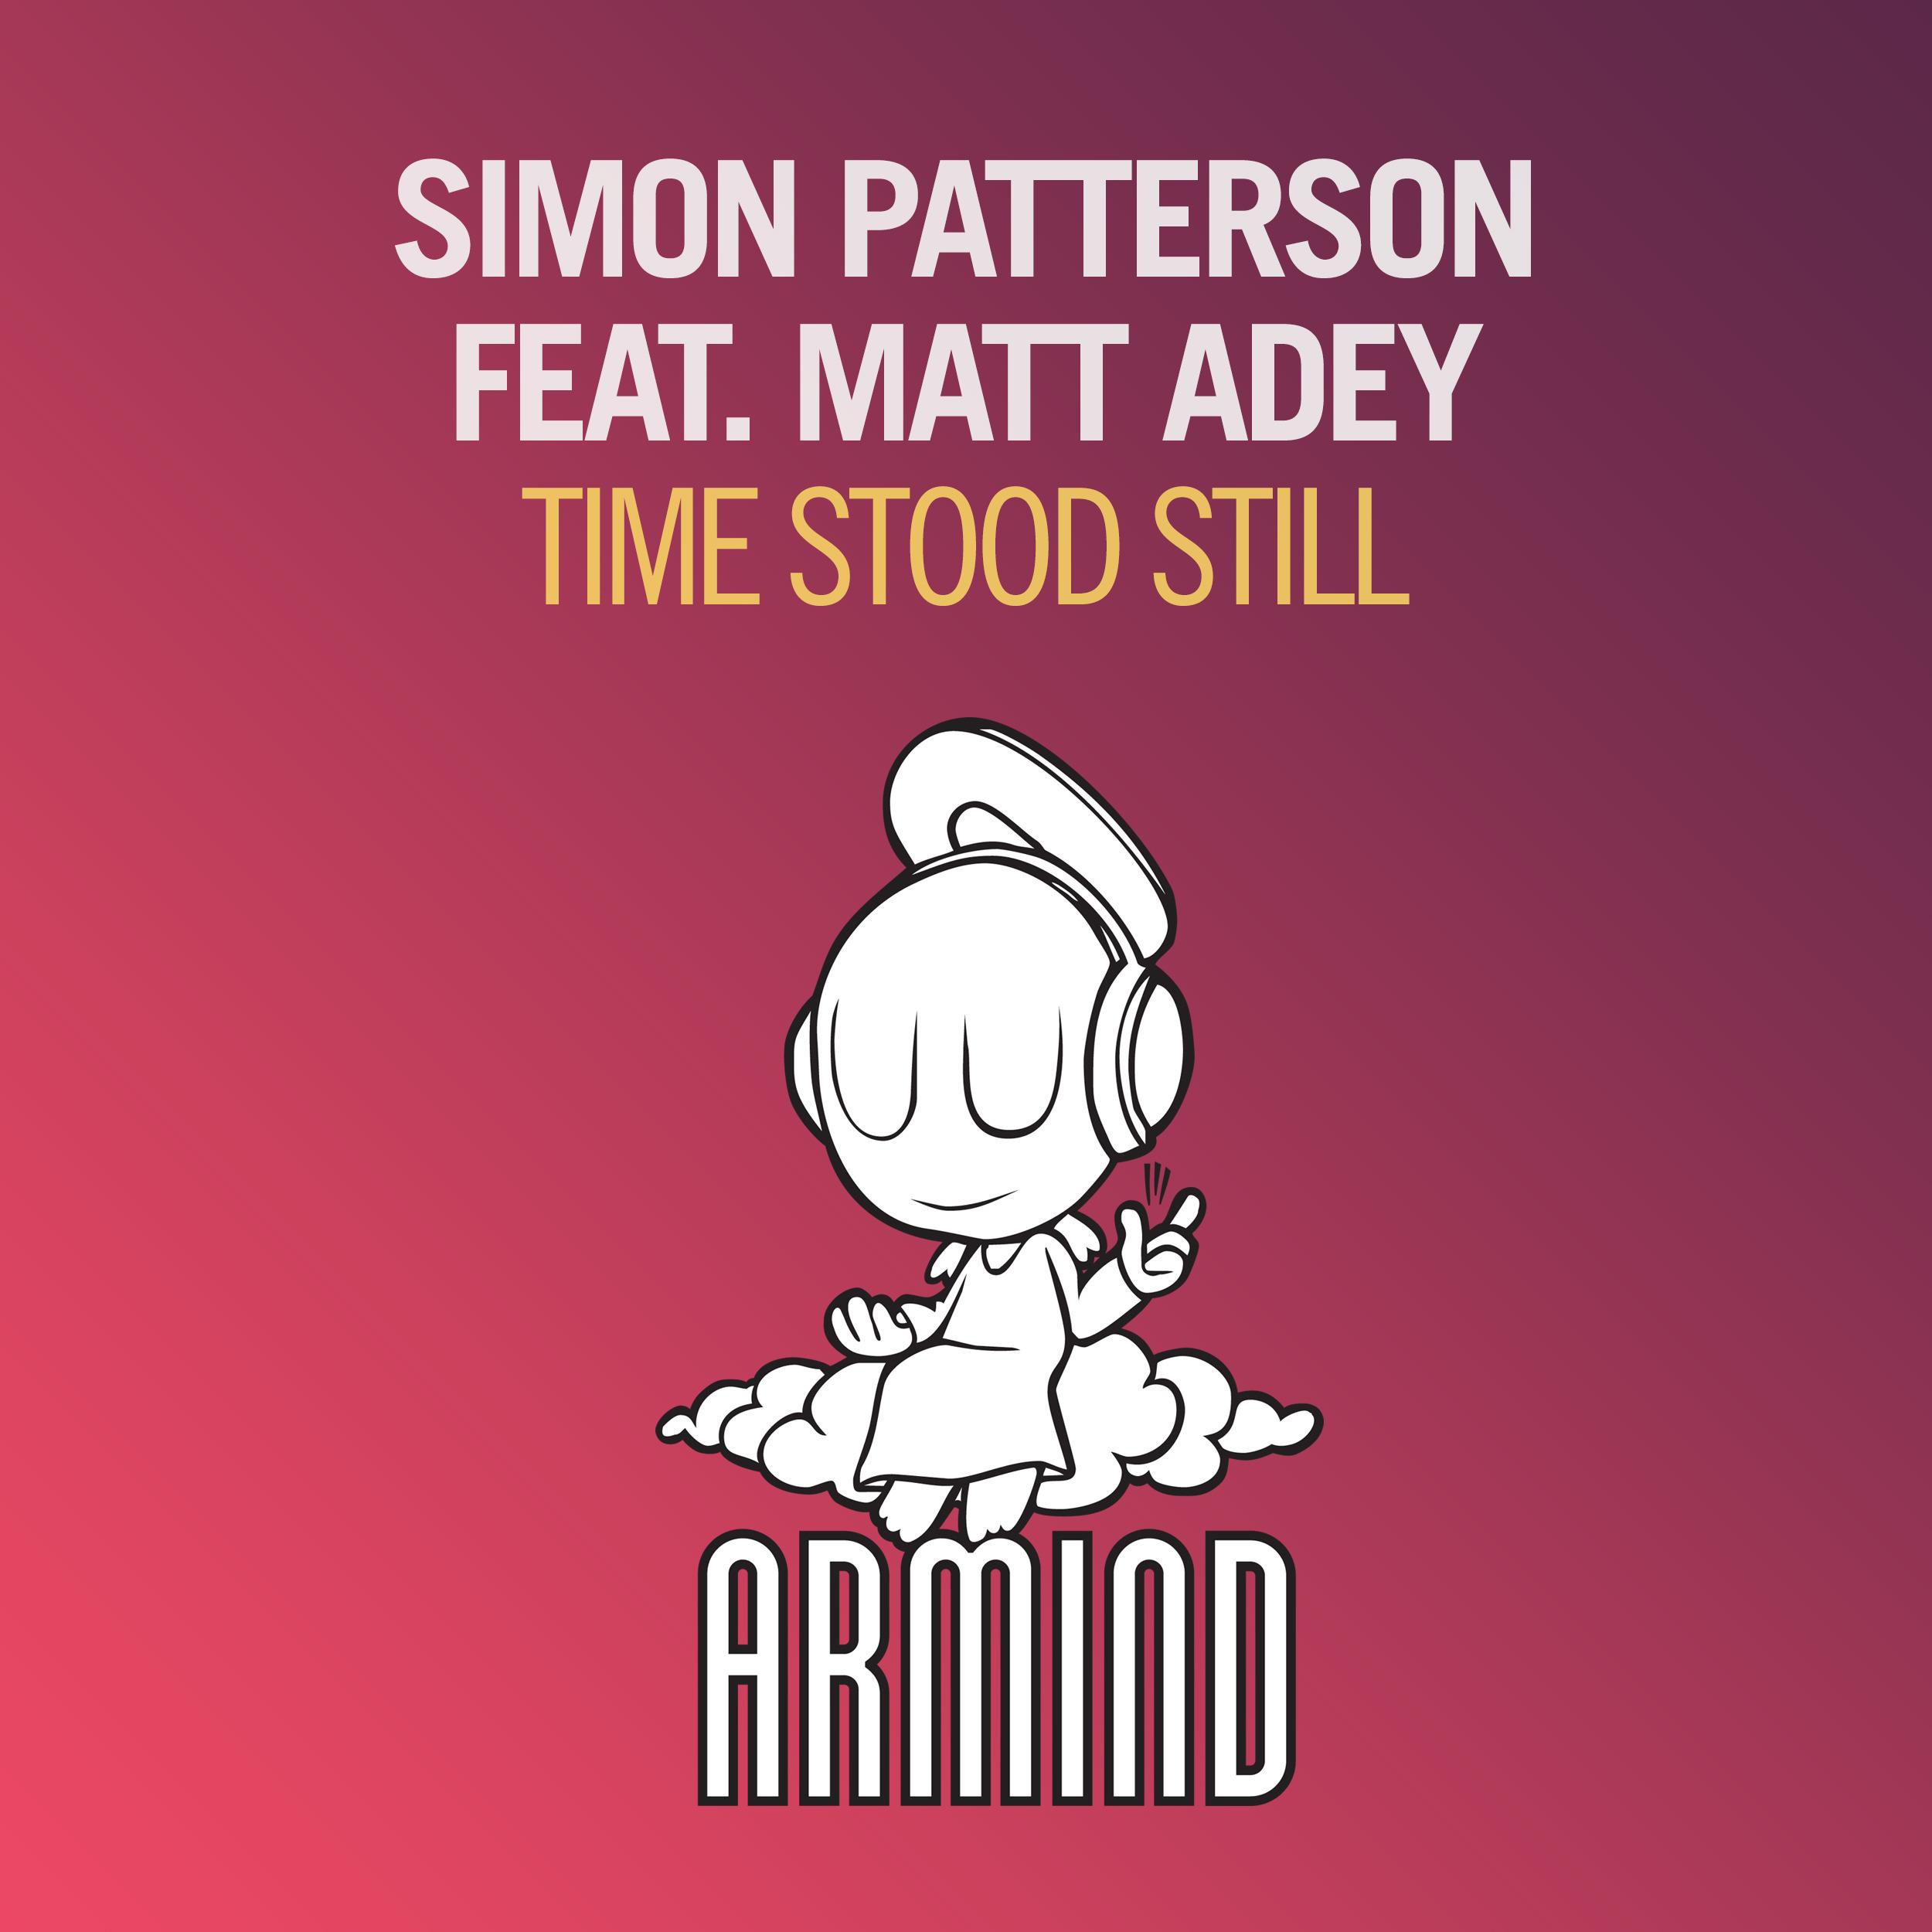 Simon Patterson - Time Stood Still